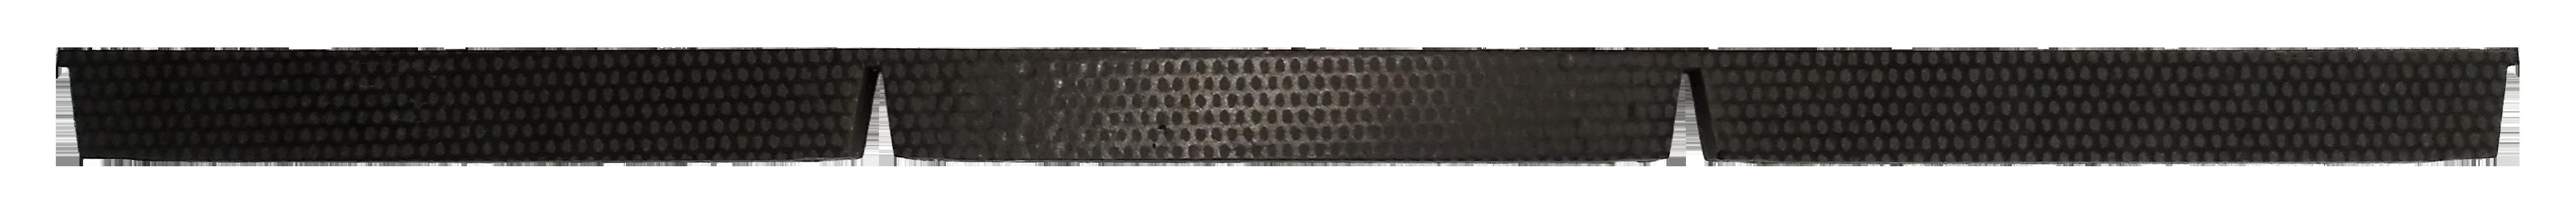 STC1512 - SNAP-TITE 1.5 12'' CLOSURE